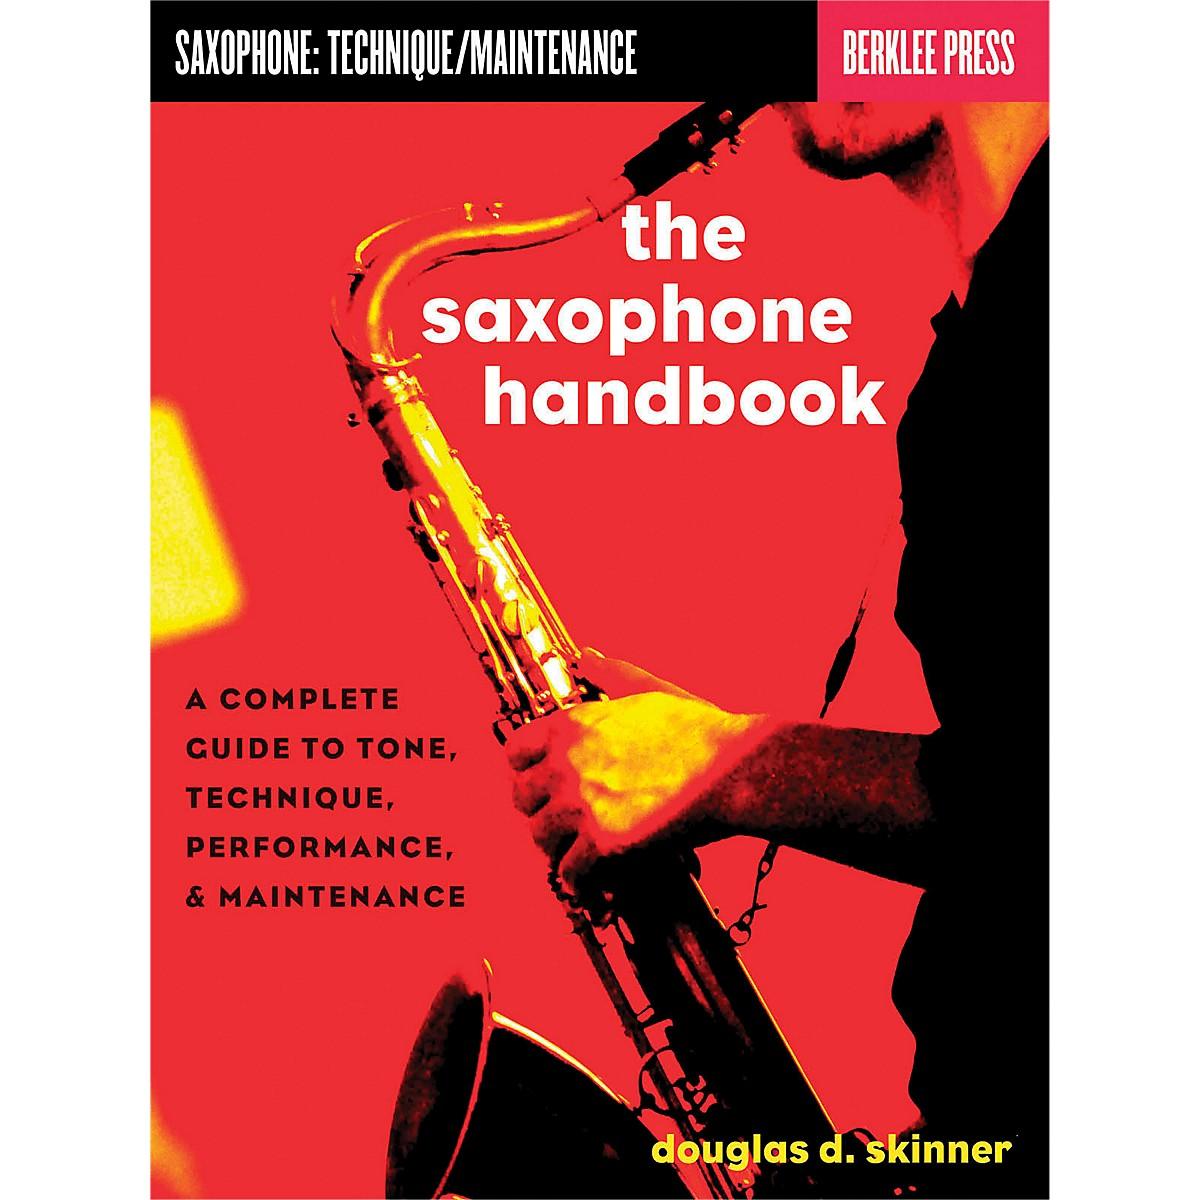 Hal Leonard The Saxophone Handbook - Complete Guide To Tone, Technique, Performance & Maintenance